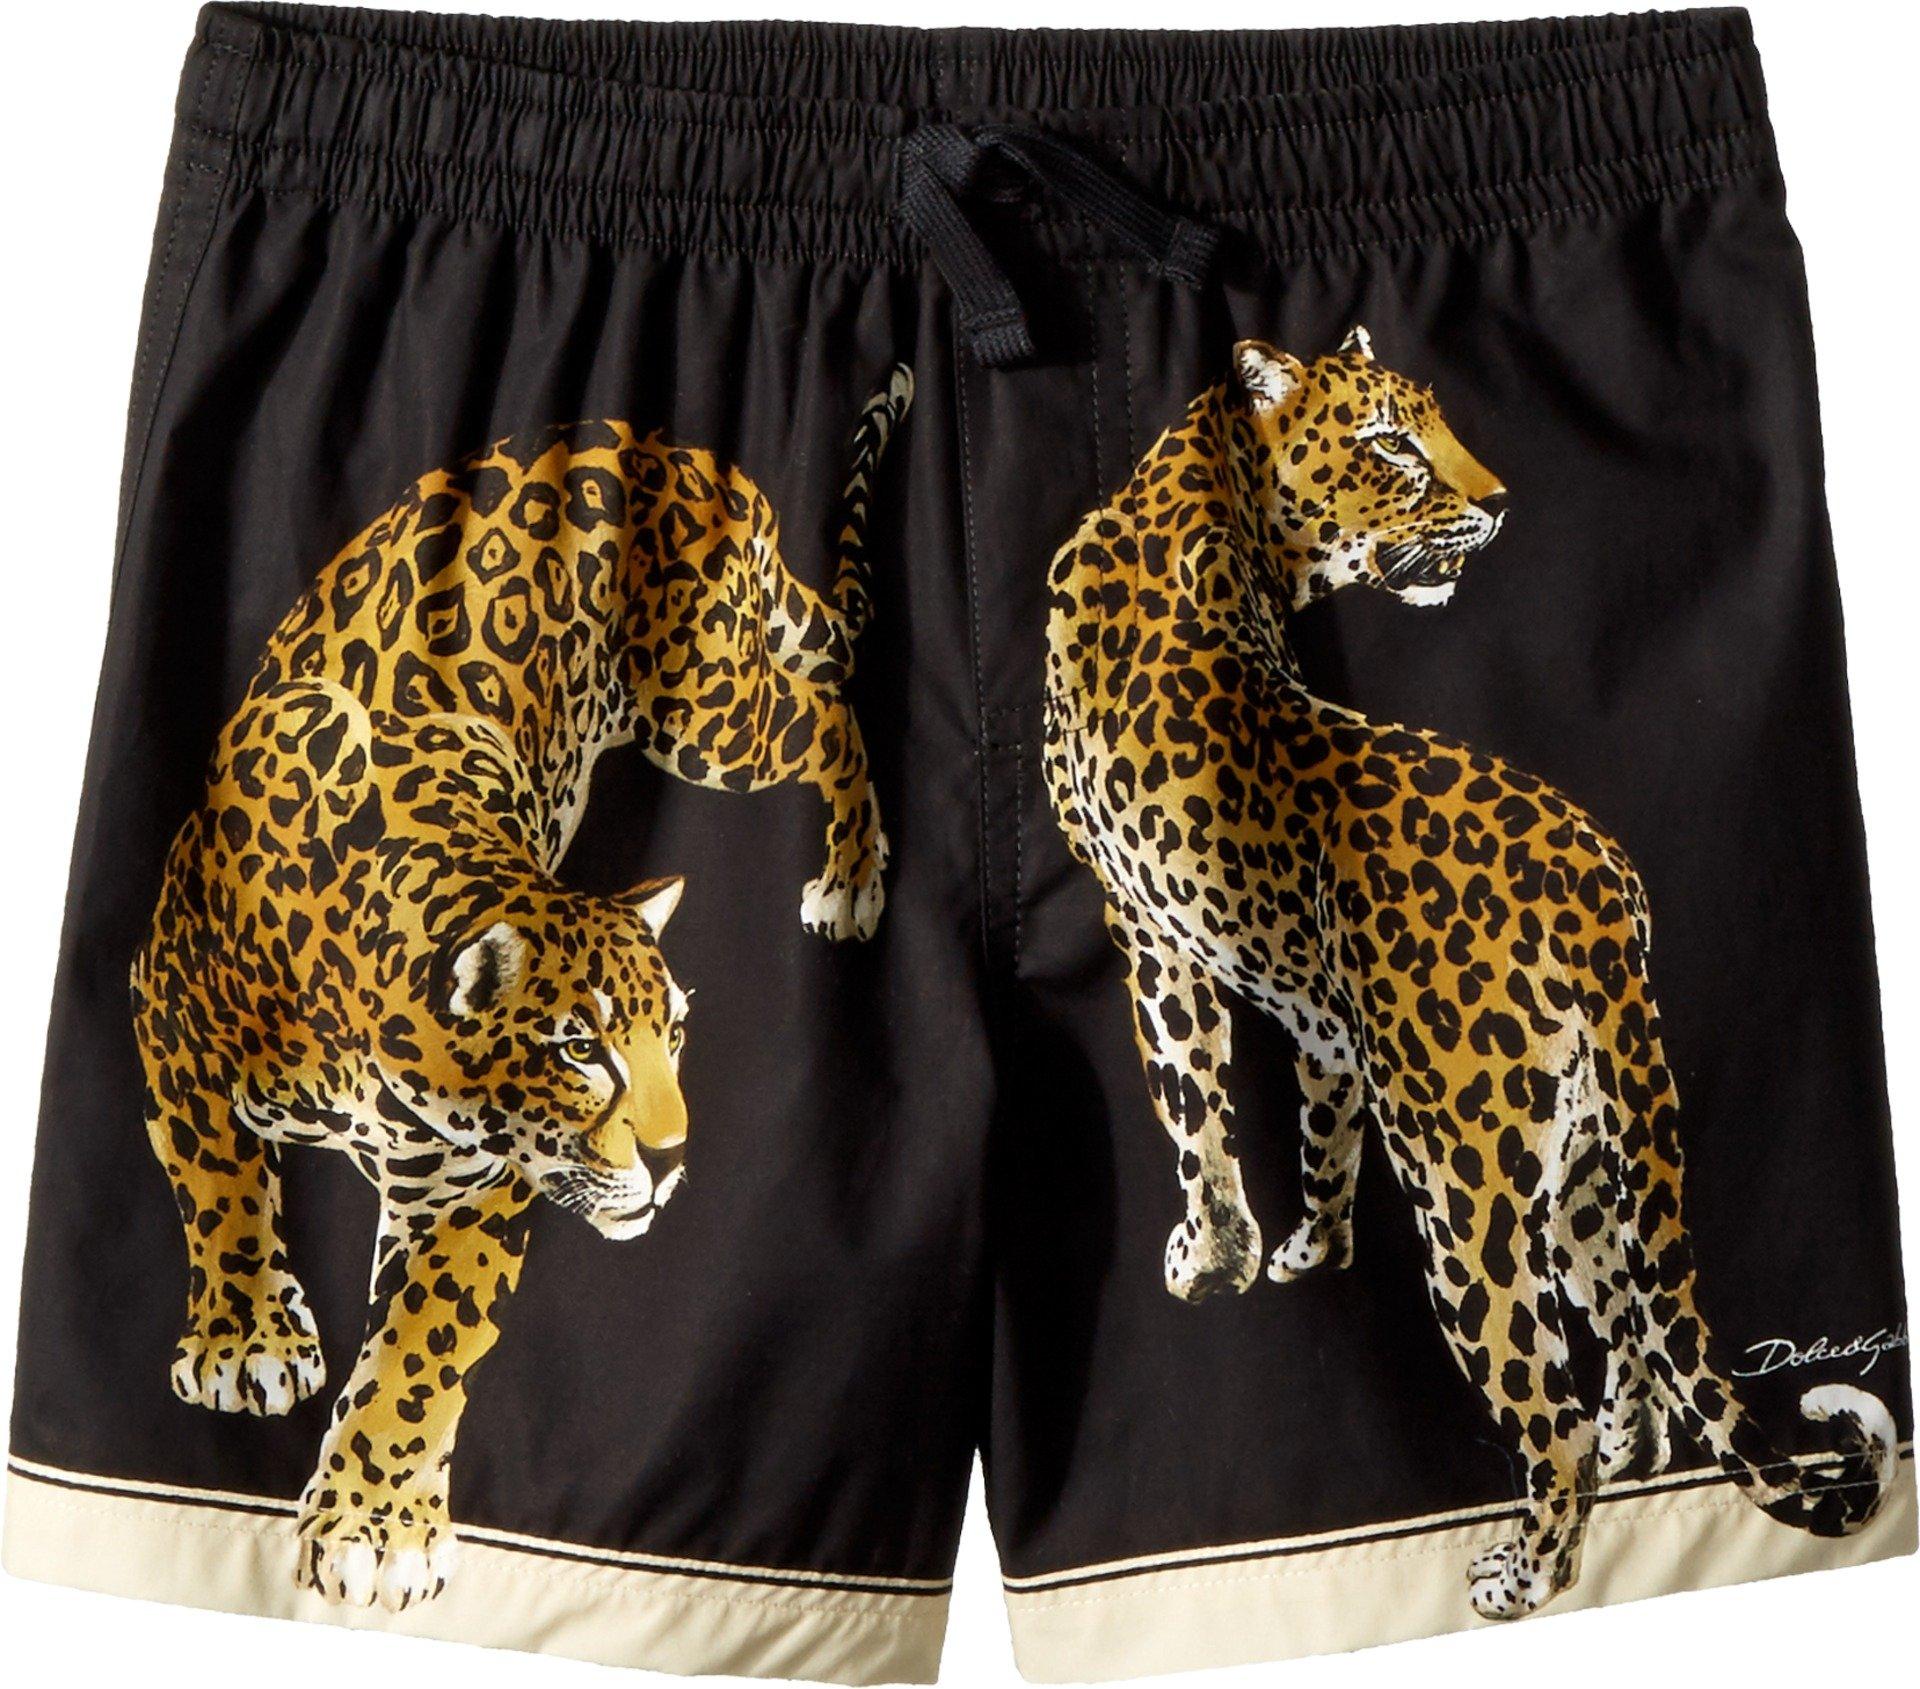 Dolce & Gabbana Kids Baby Boy's Shorts (Toddler/Little Kids) Black Leopard Print 5